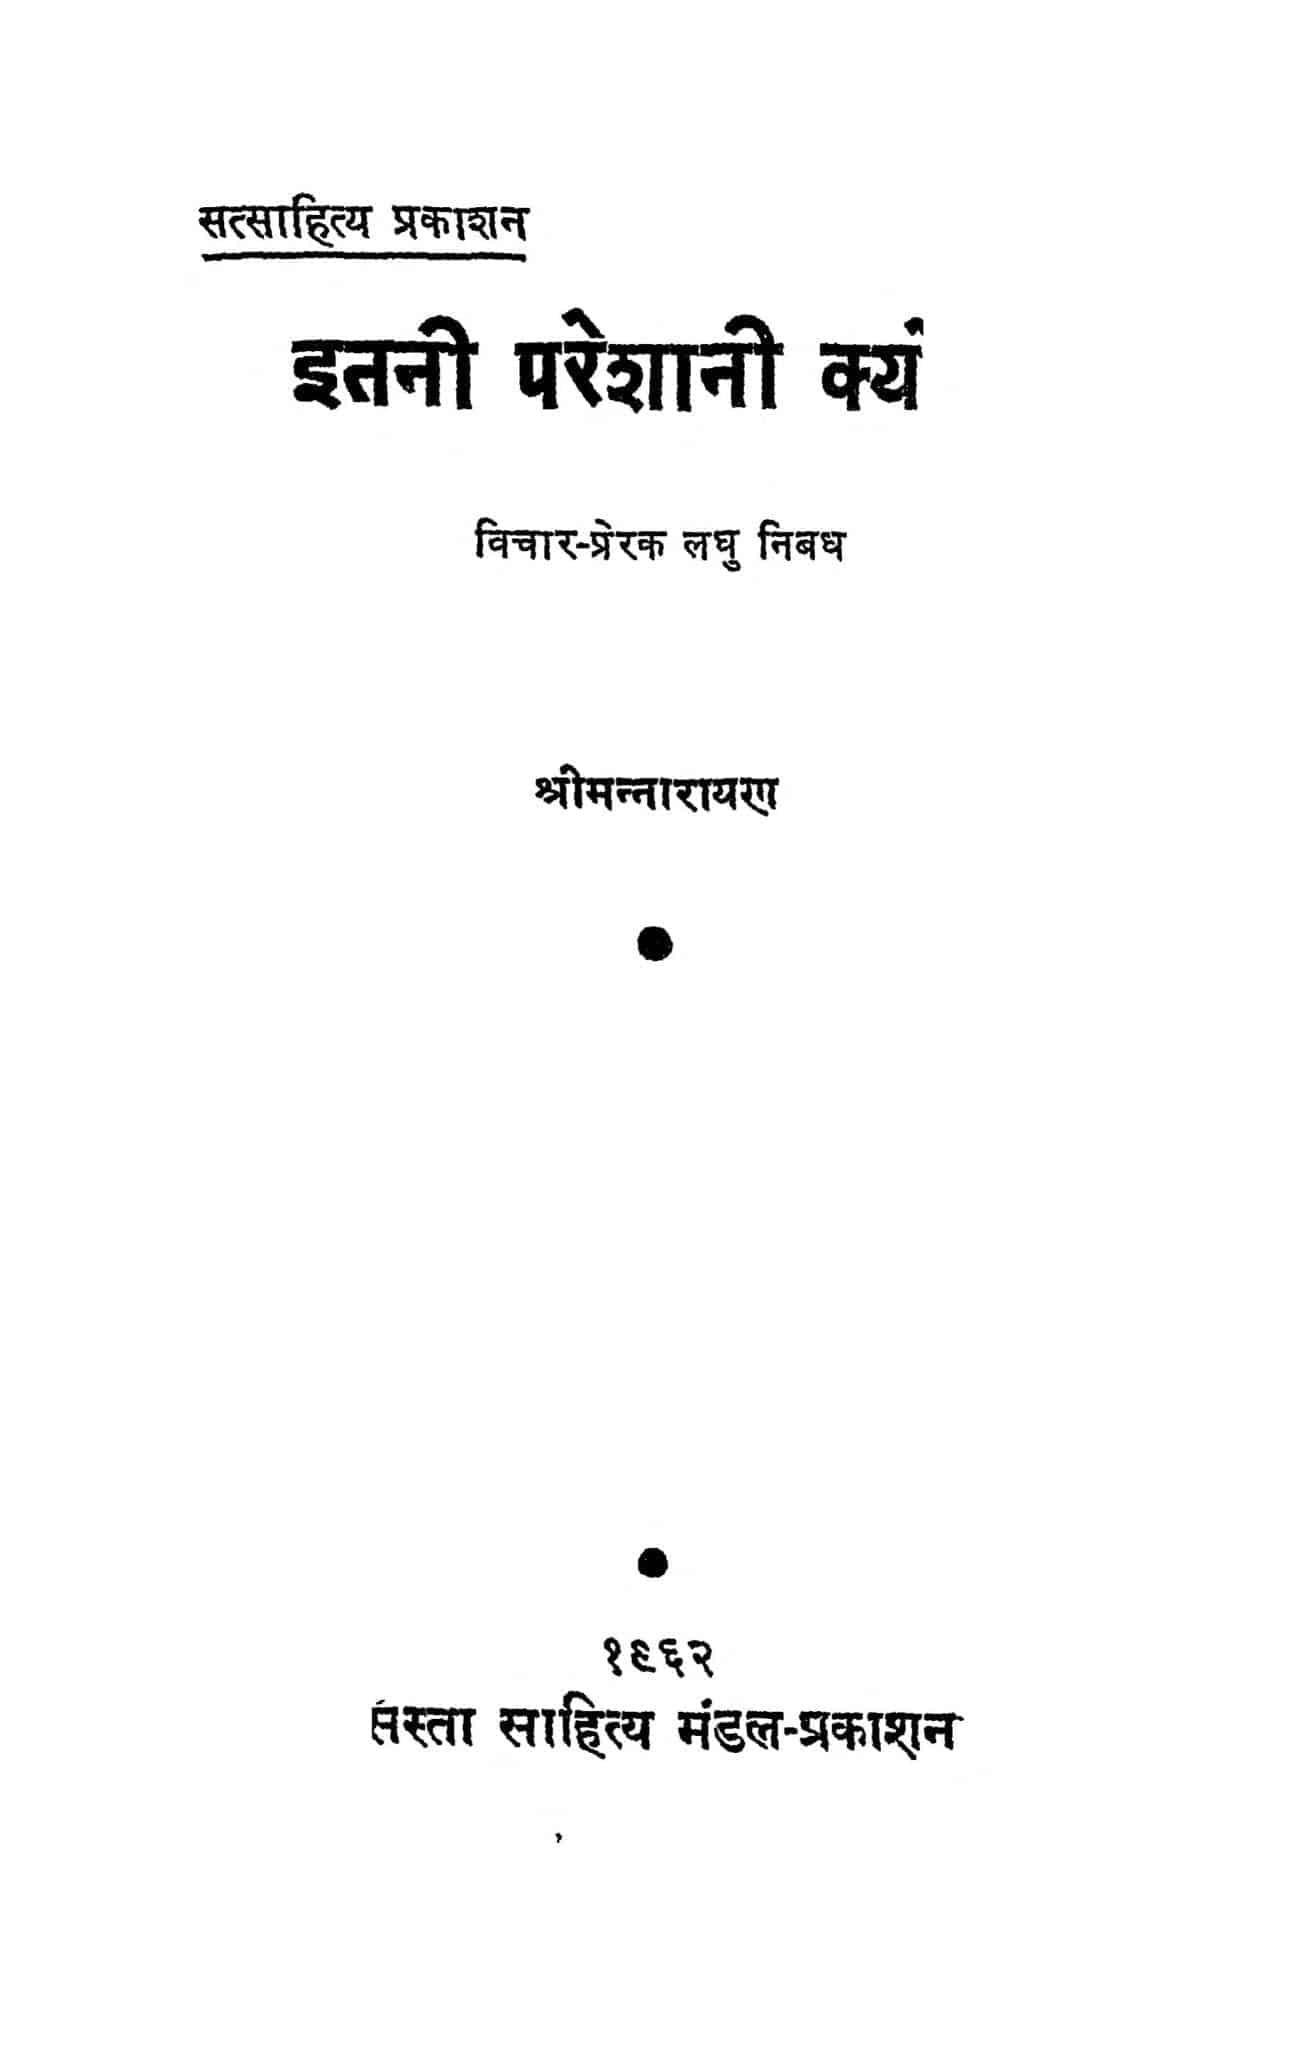 Itani Pareshani Kyon by श्रीमन्नारायण - Shreemannanarayan